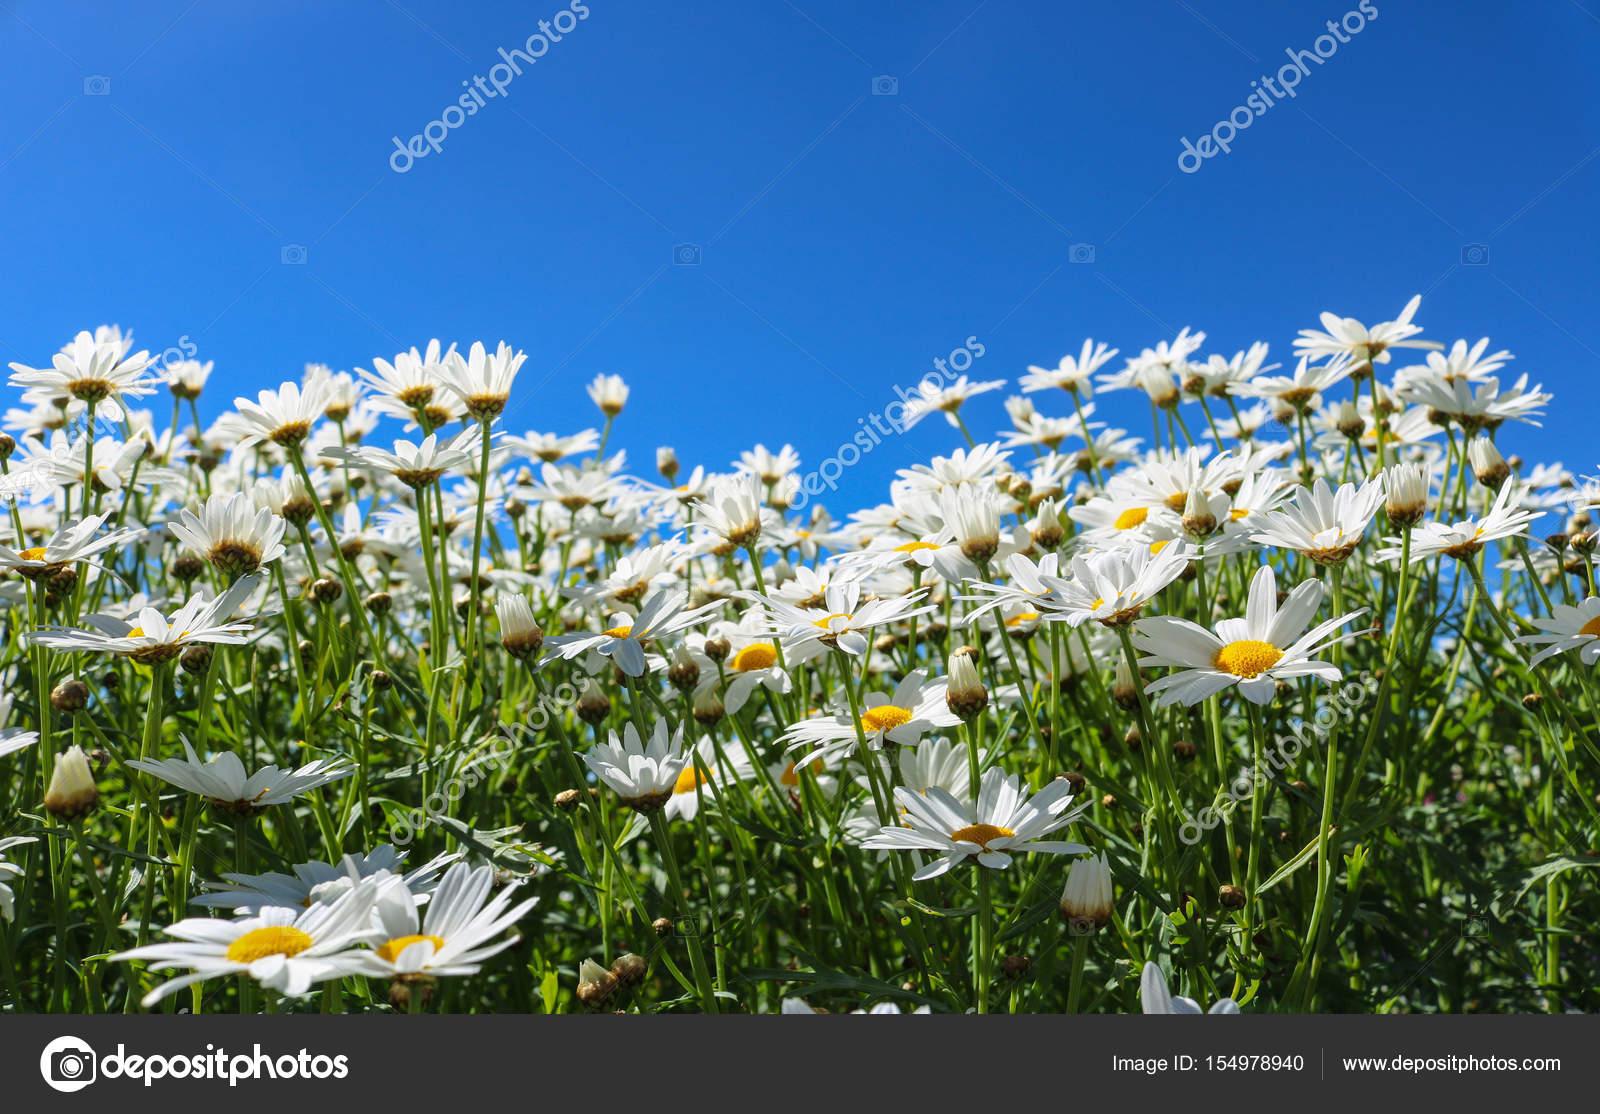 The Daisy Flower Symbolizes Innocence A Loyal Of Love Stock Photo